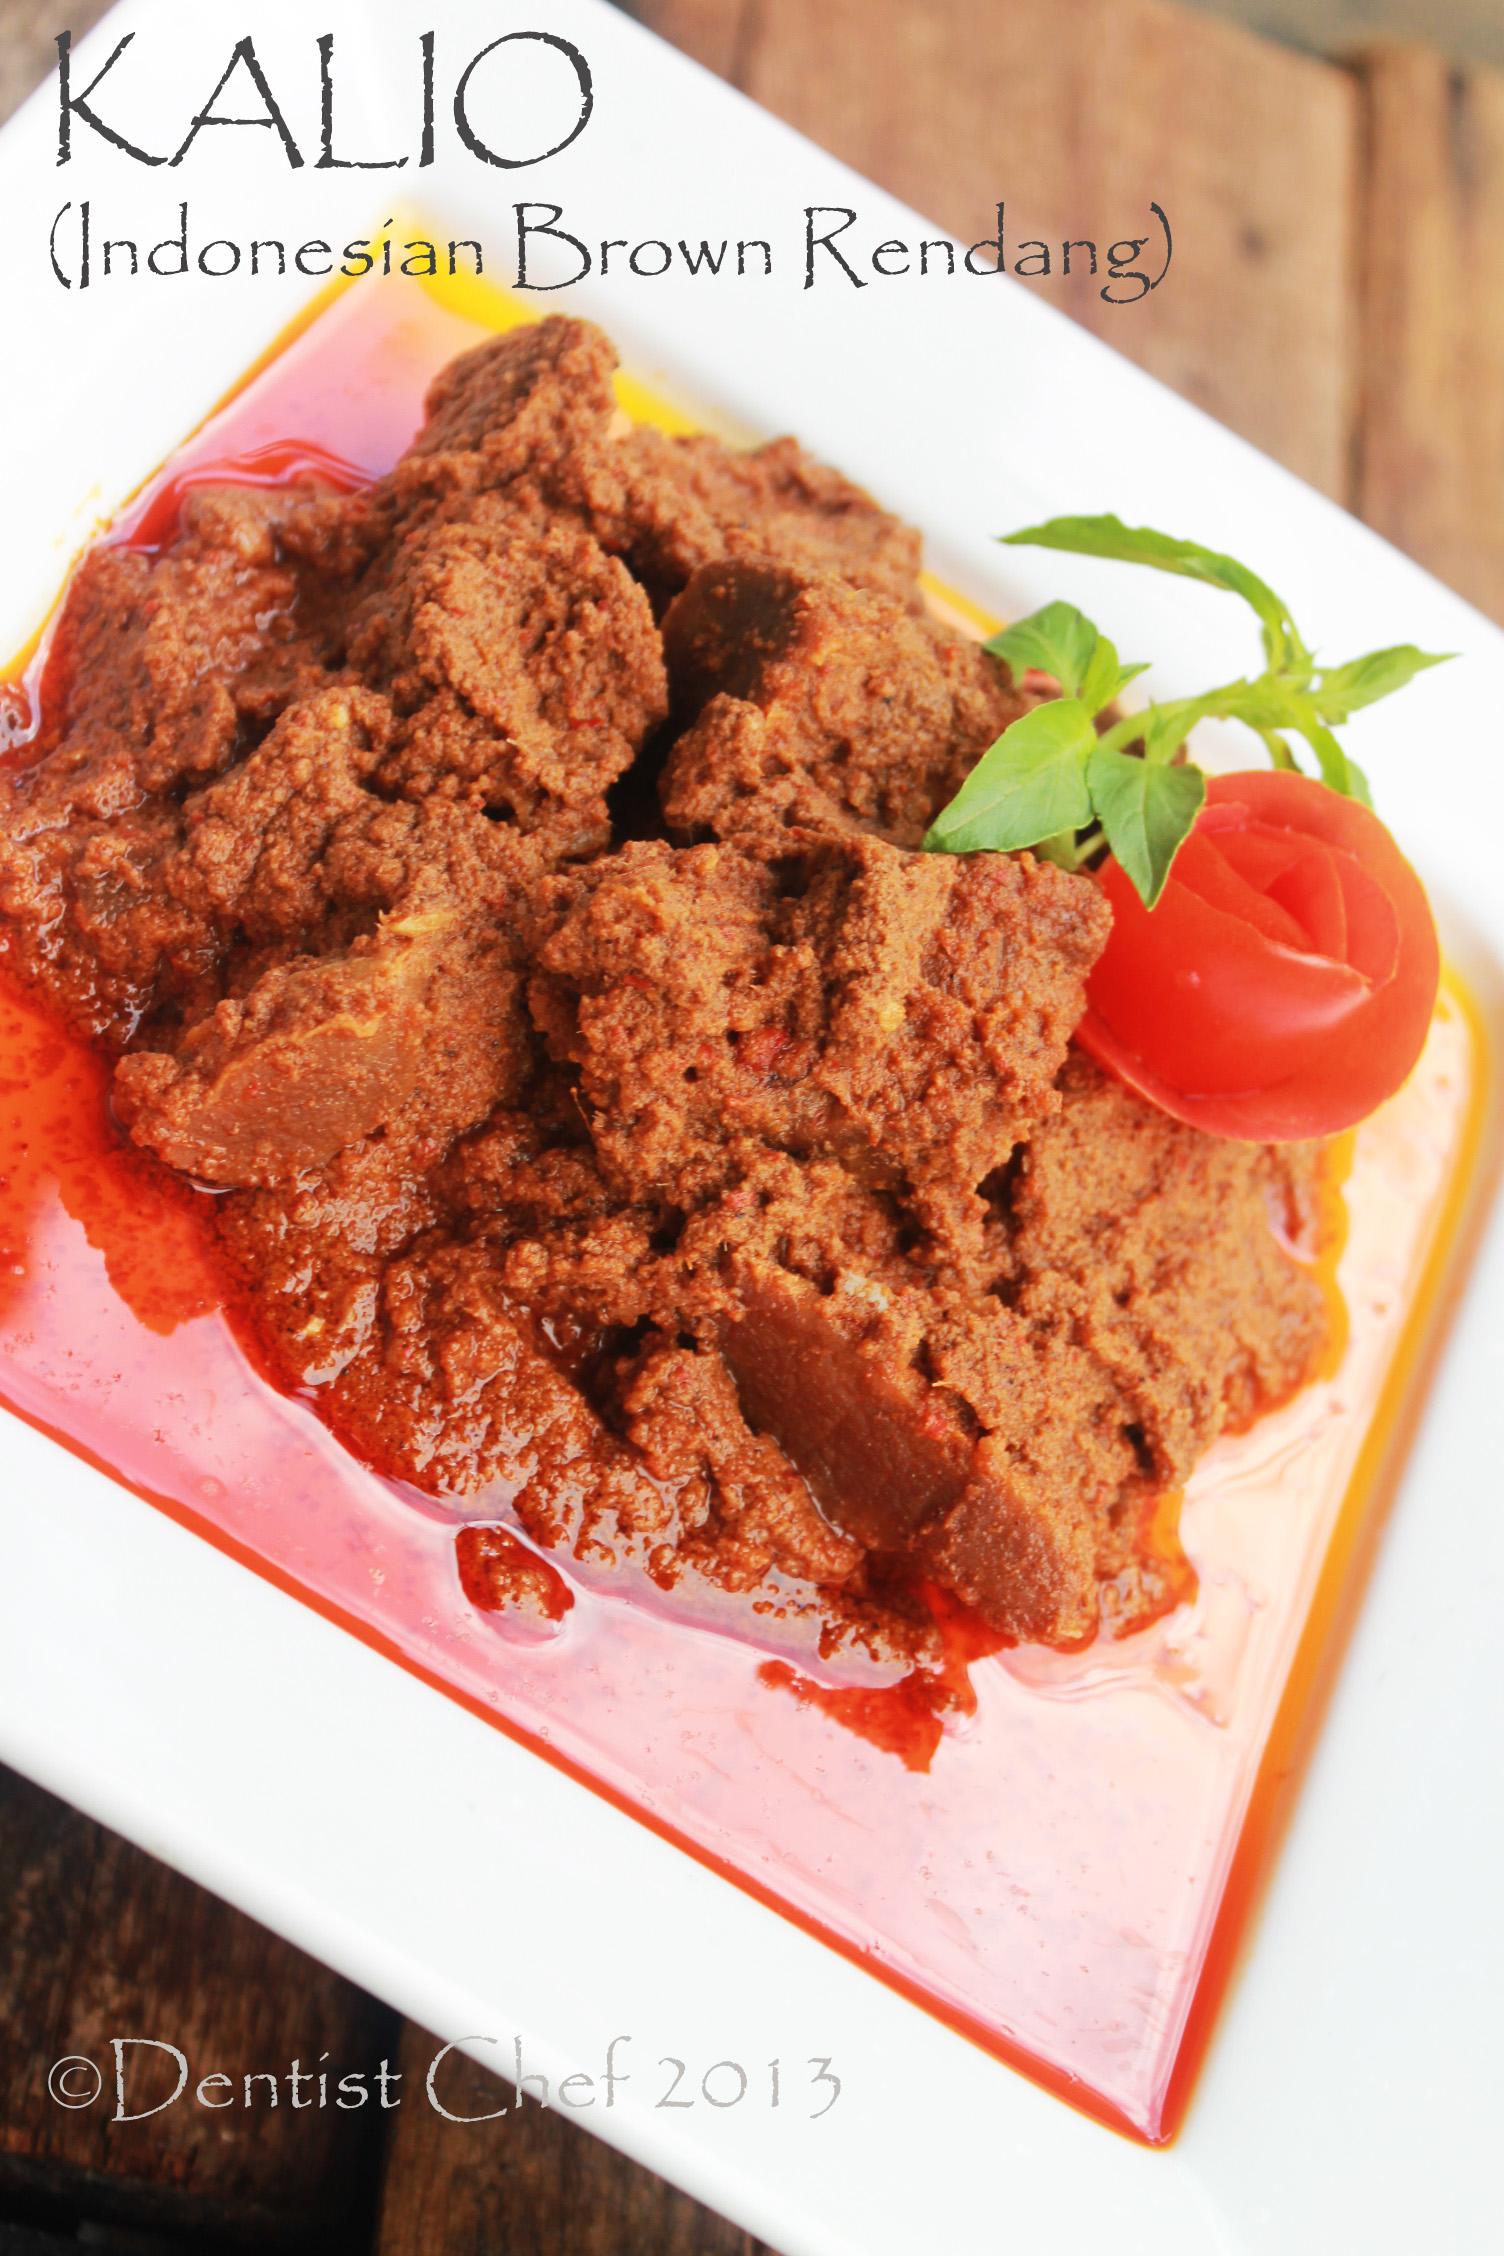 Resep kalio daging sapi rendang padang indonesian beef rendang brown color